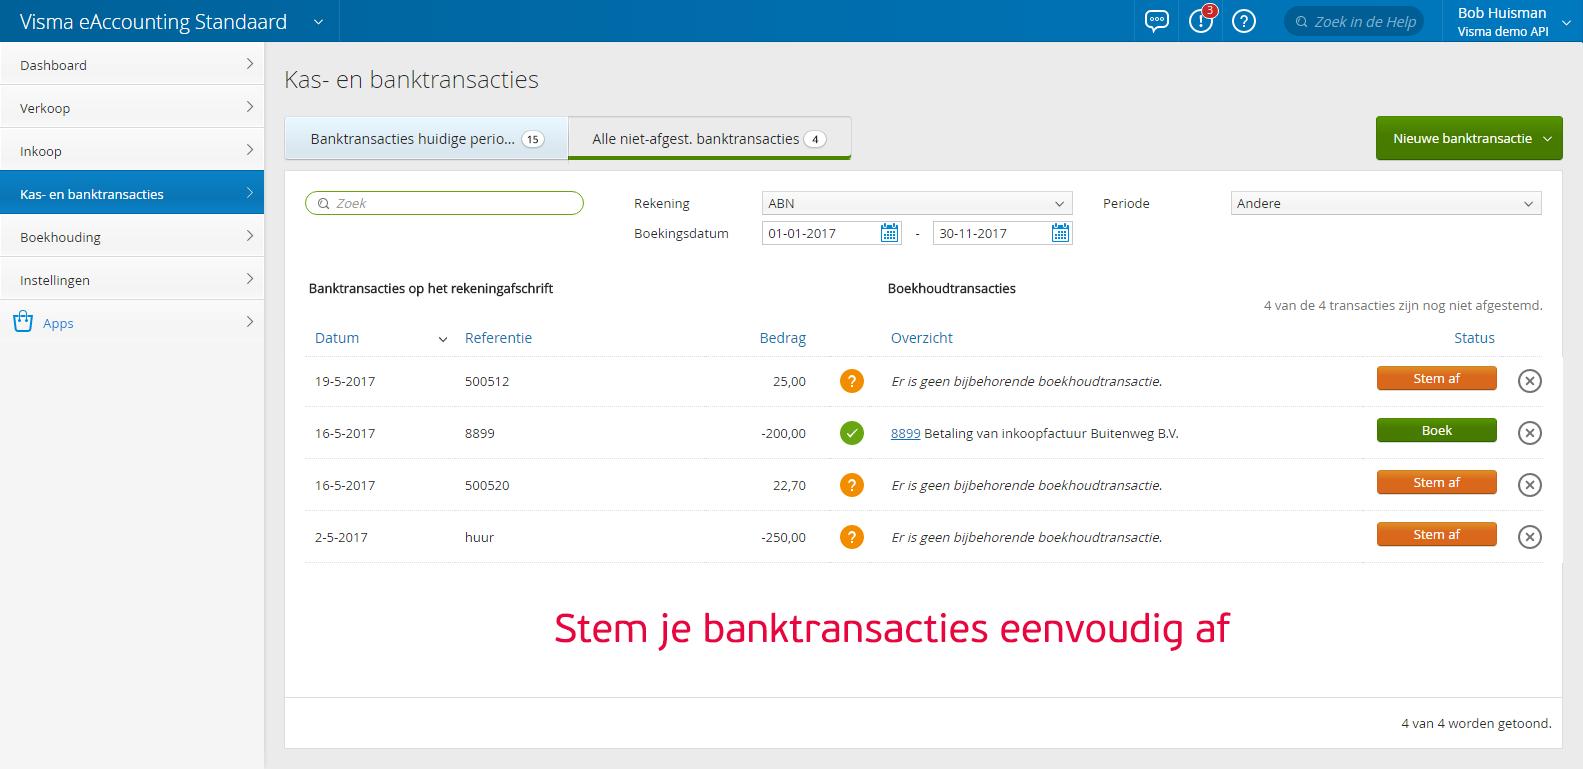 screenshot Visma